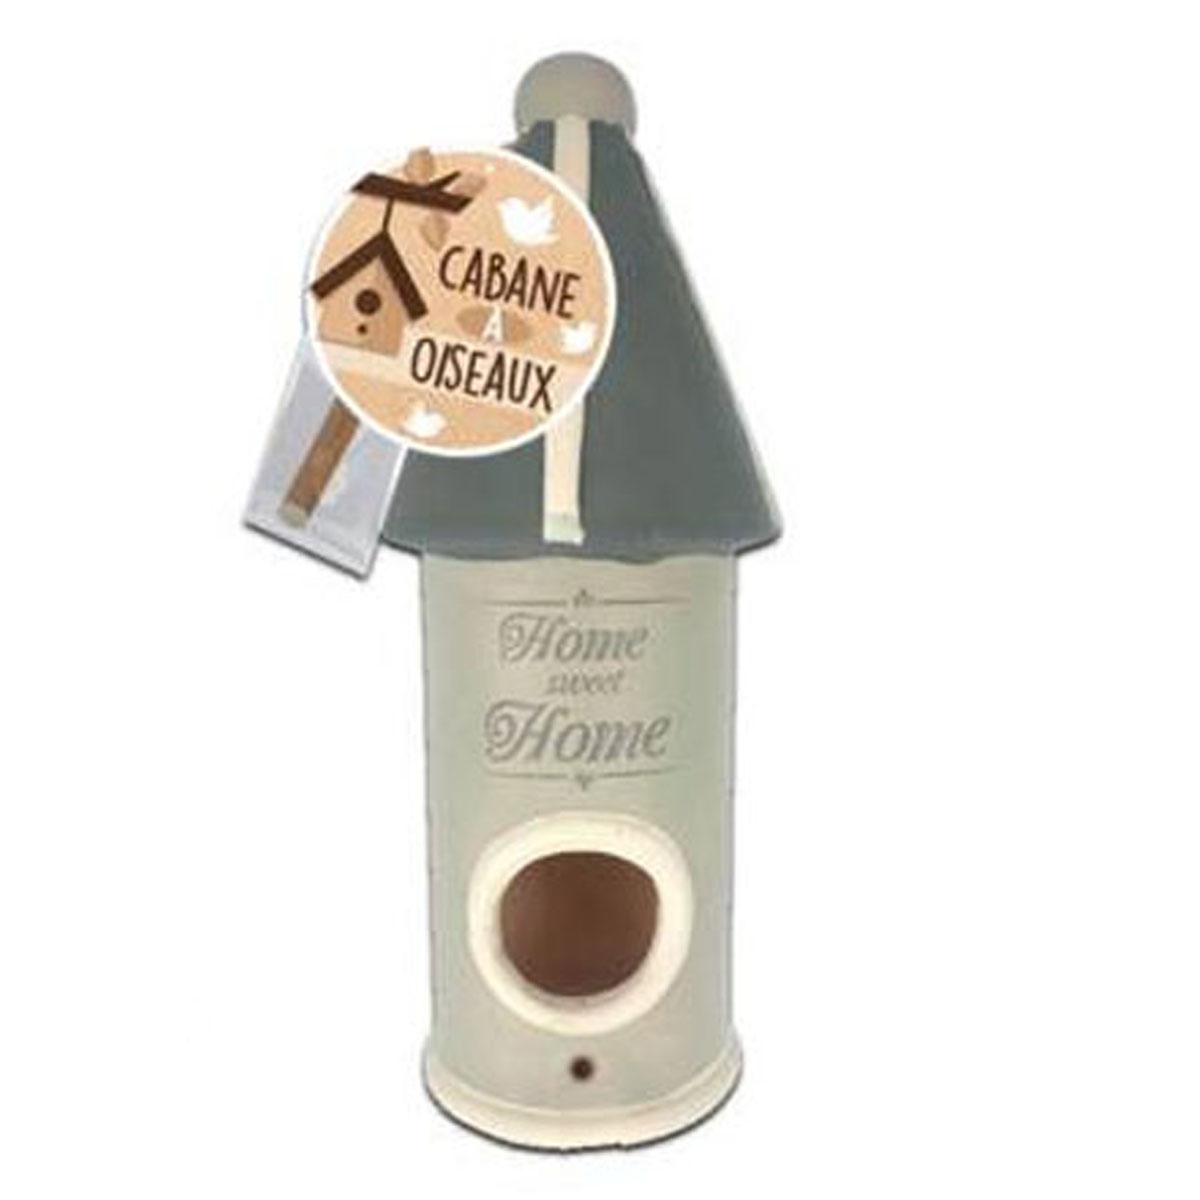 Nichoir céramique \'Home Sweet Home\' gris - 25x9 cm - [P8860]